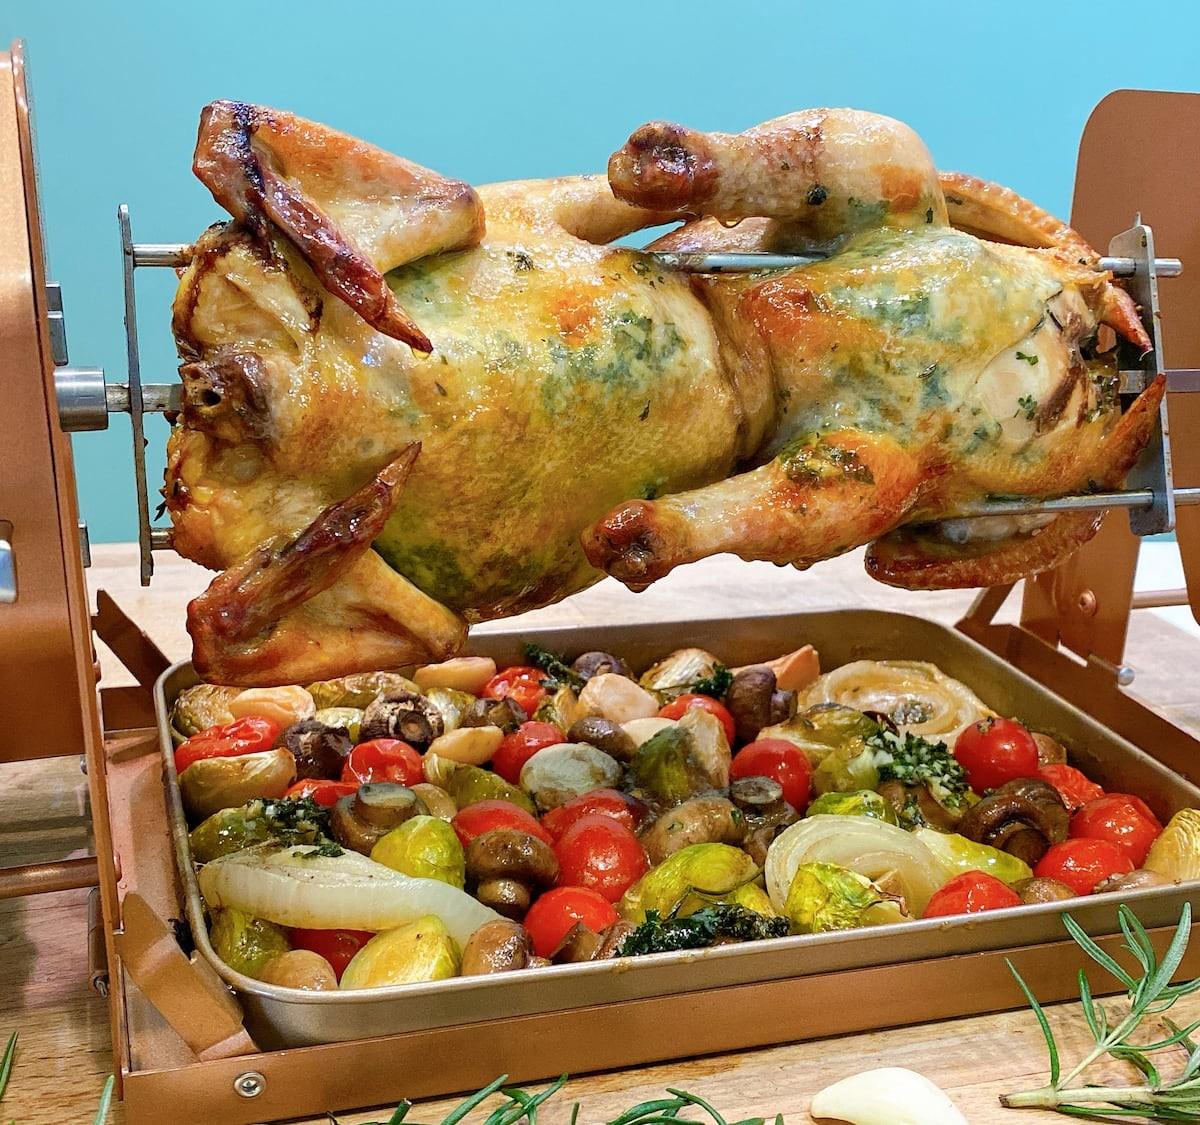 ROTO-Q 360 Non-Electric Rotisserie makes healthier eating an easy option